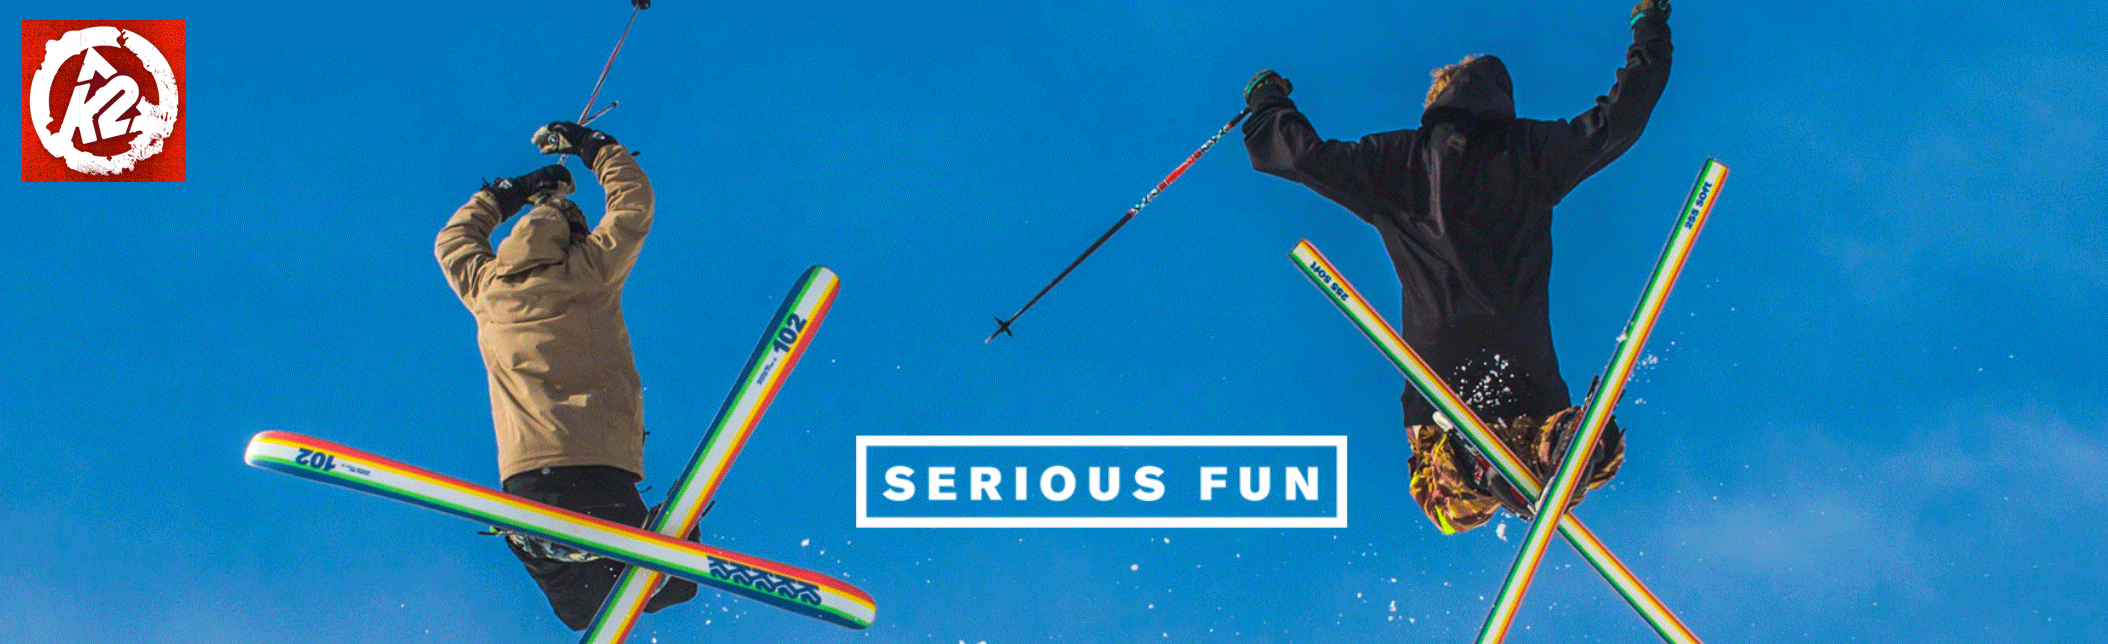 k2-corporation-skis-banner-01.png